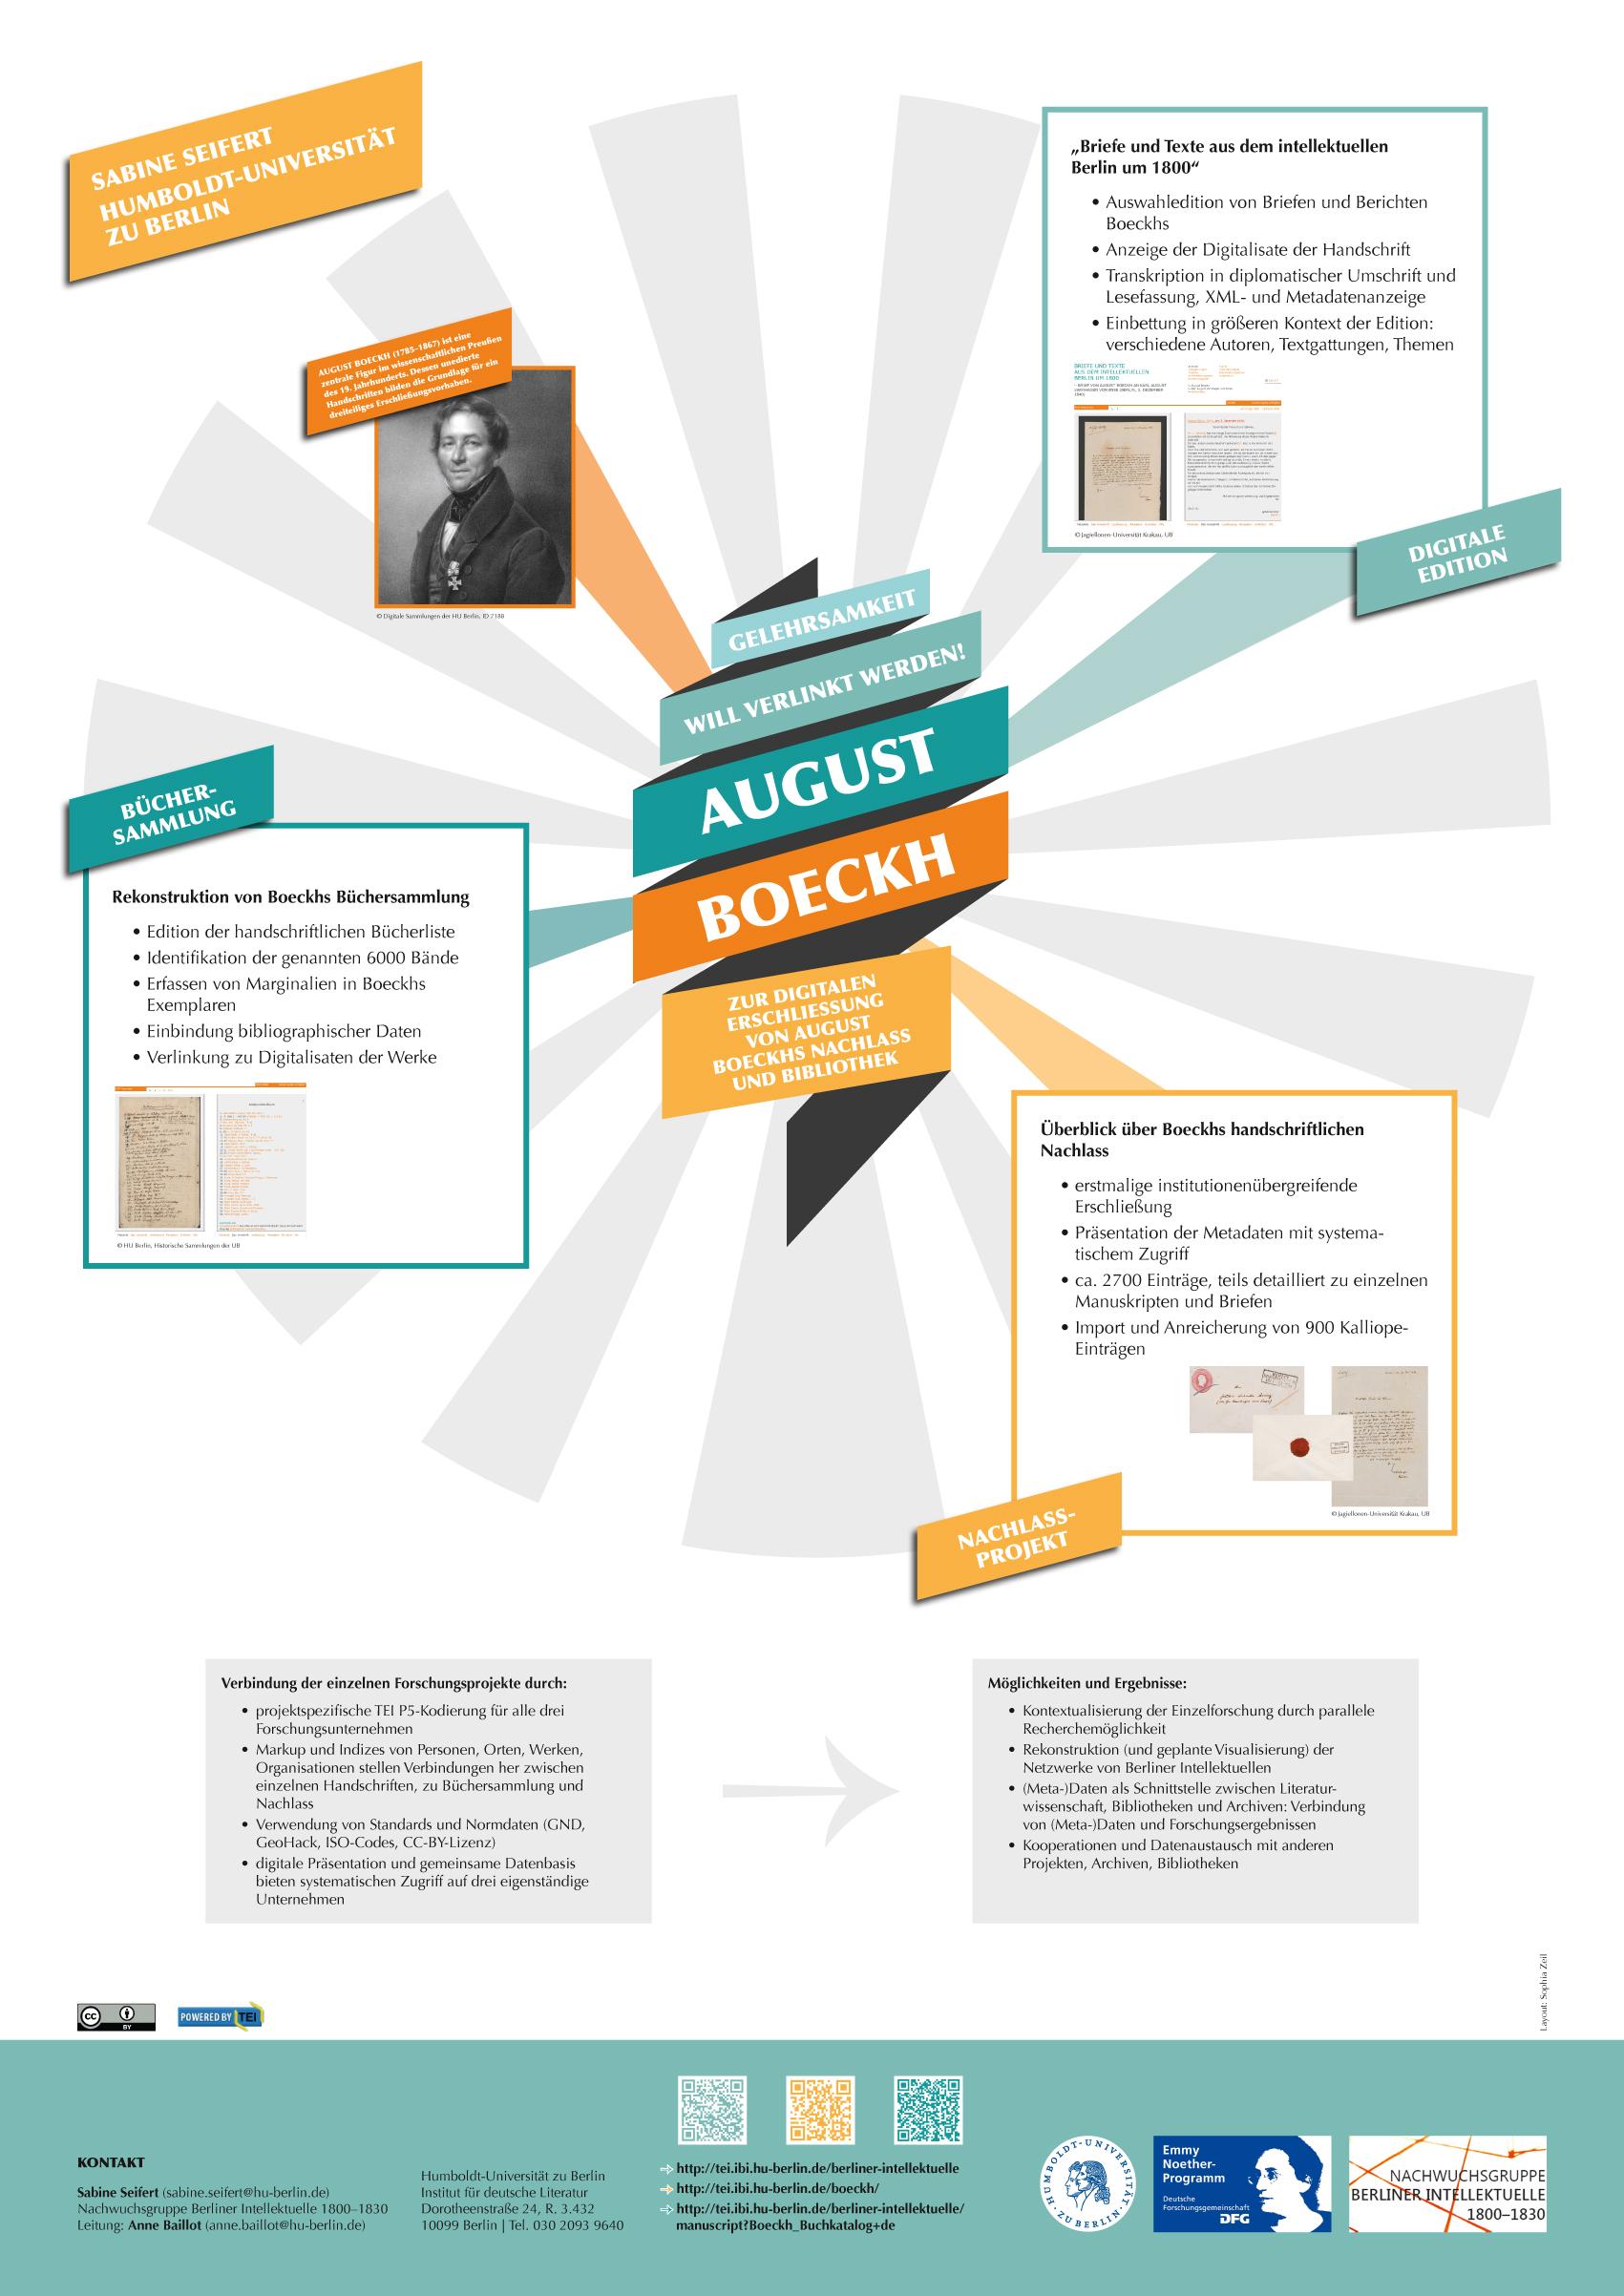 Boeckh-Projekte verknüpfen